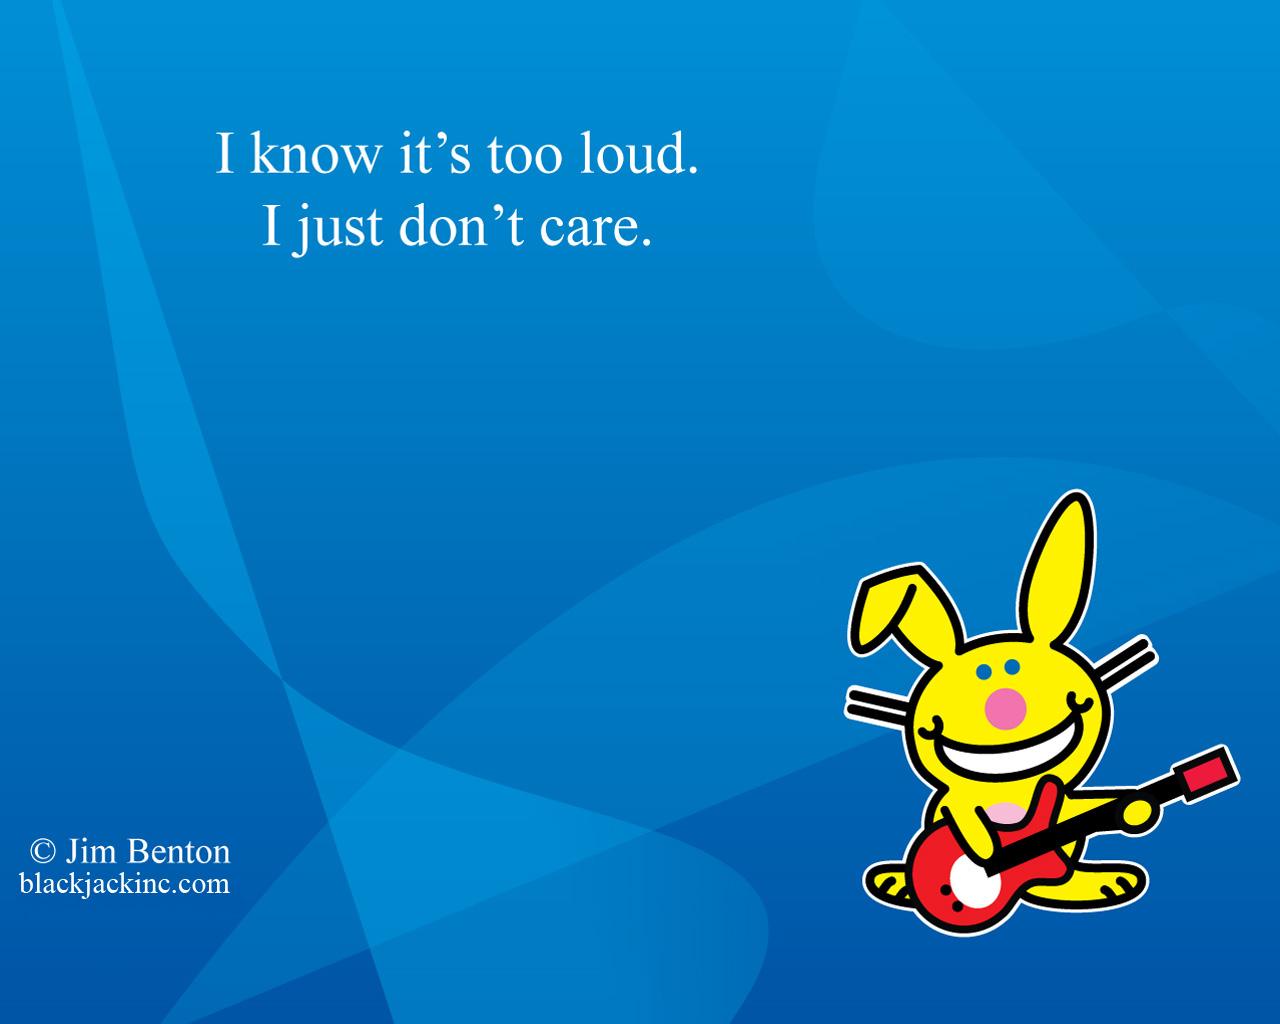 http://1.bp.blogspot.com/-IKr99ILxaz0/TZyMXljwwGI/AAAAAAAAAH4/12cOB3X6DVc/s1600/its_happy_bunny_background_wallpaper_i_know_how_you_feel_1280-782097.jpg